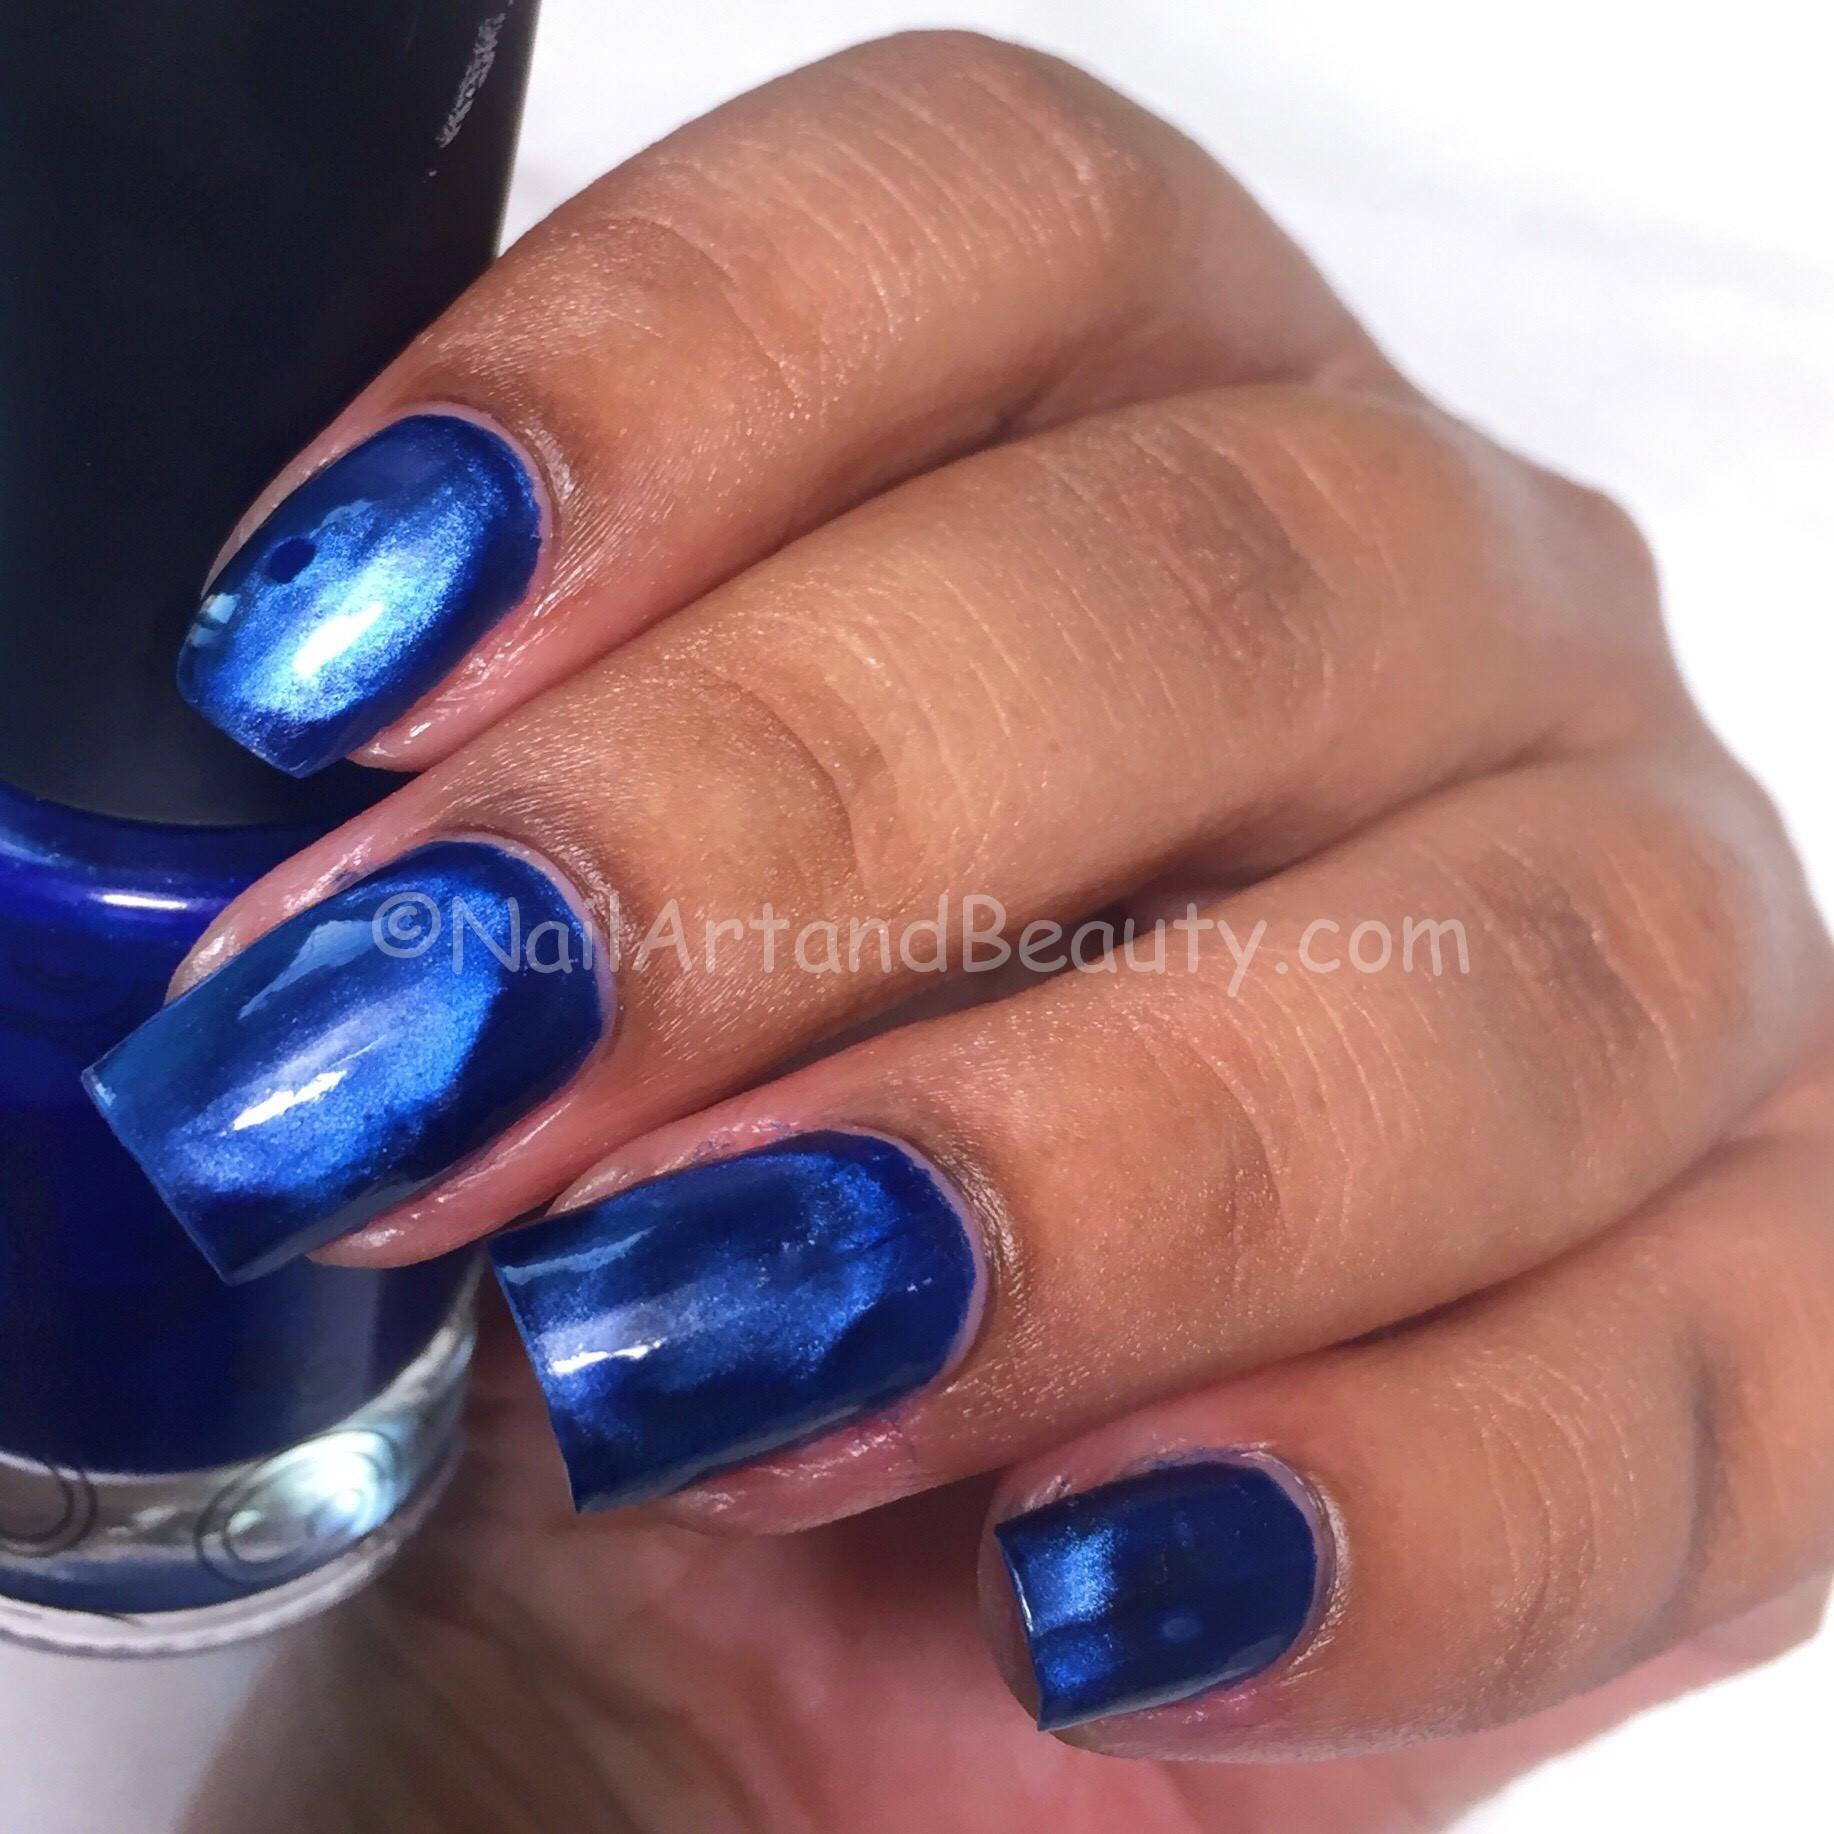 Masura Cobalt Damasse Swatch